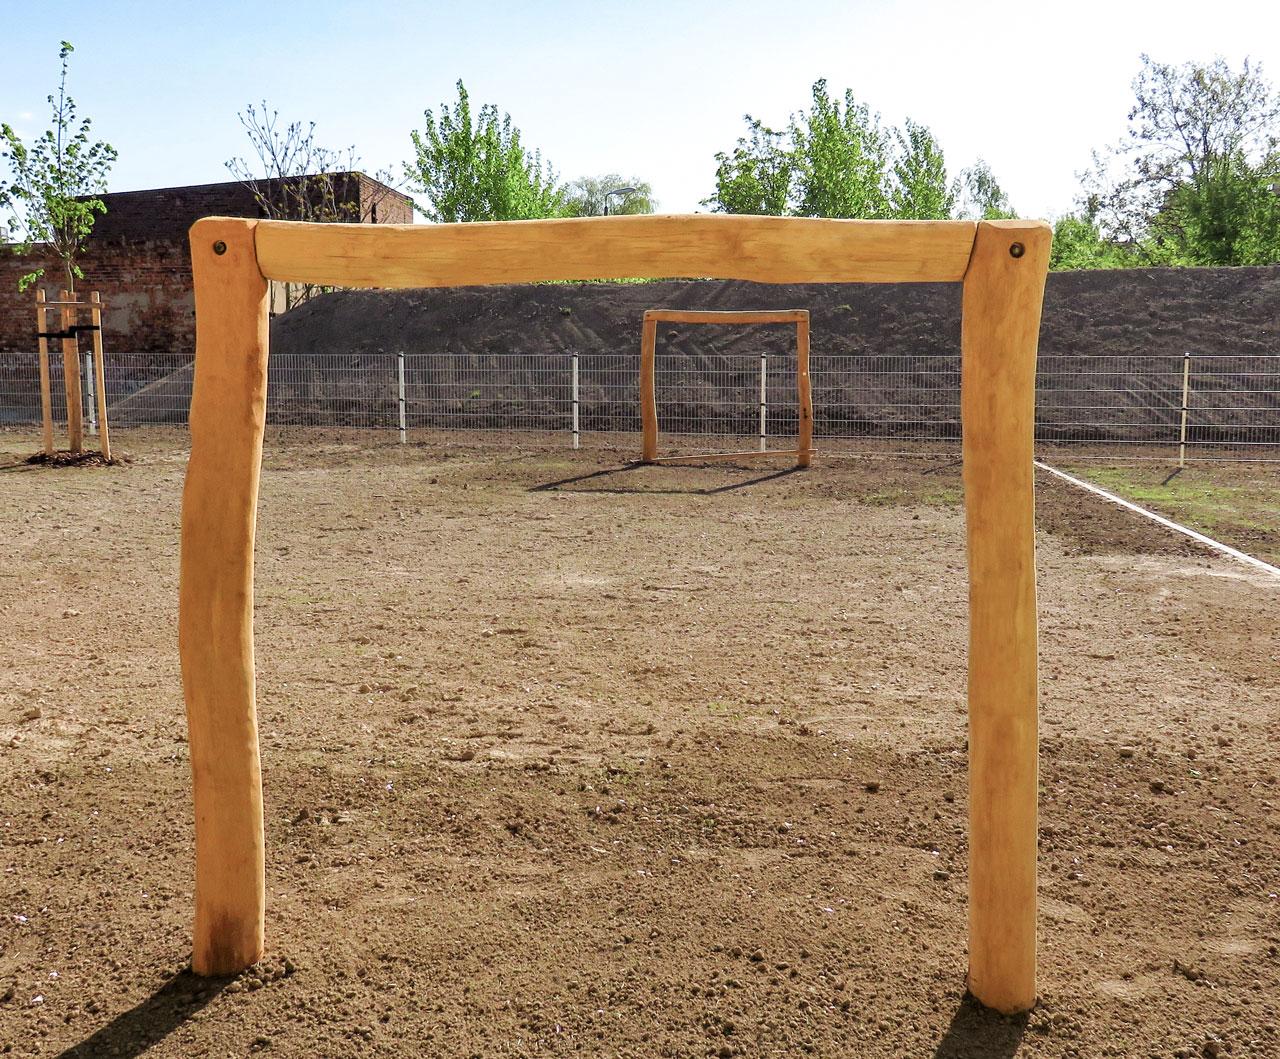 R 2-2b Fußballtor, Tor ohne Netz